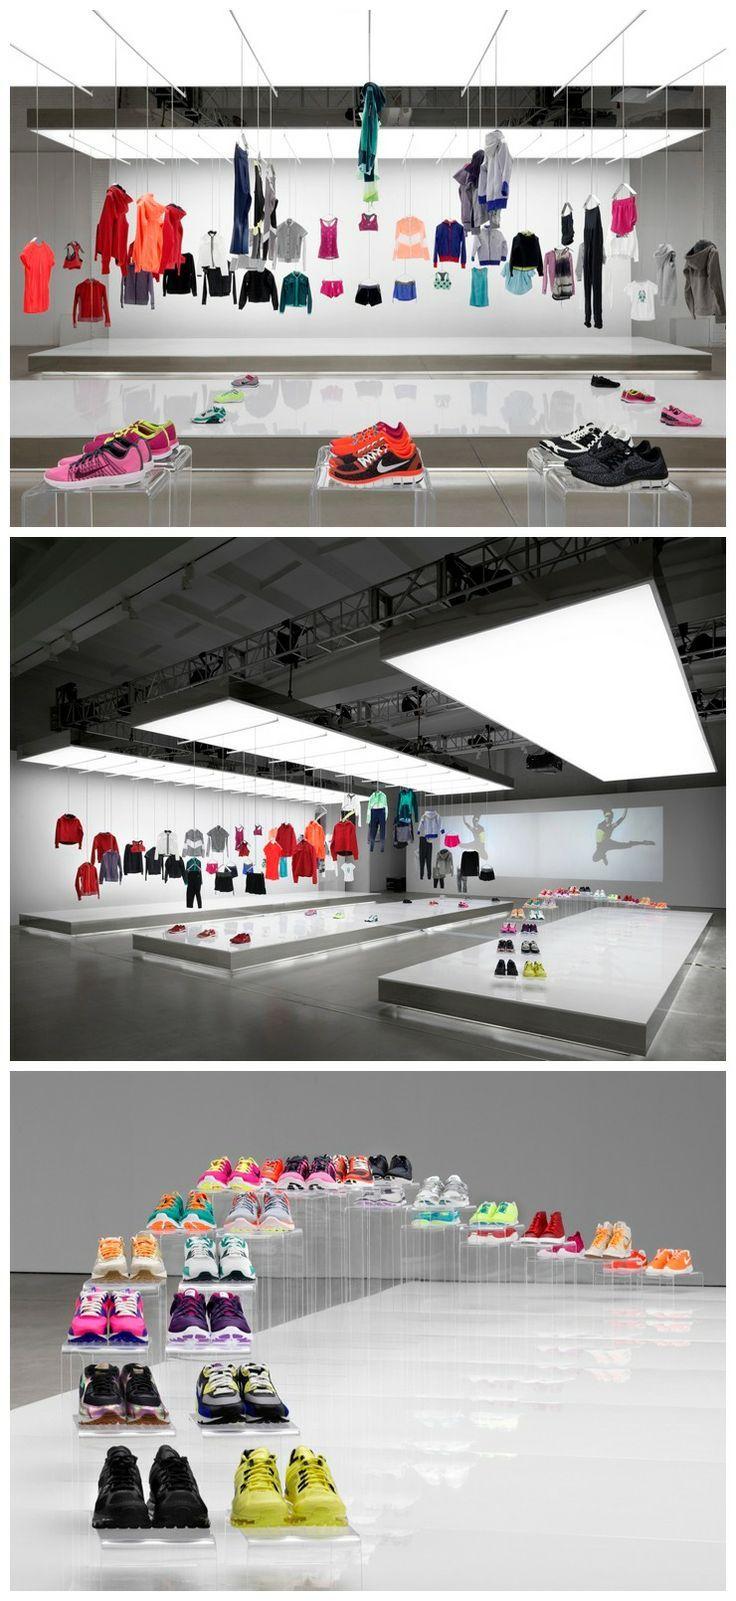 shoes clothes showroom glass white display lighting ayakkabı kıyafet beyaz cam ışık sergi